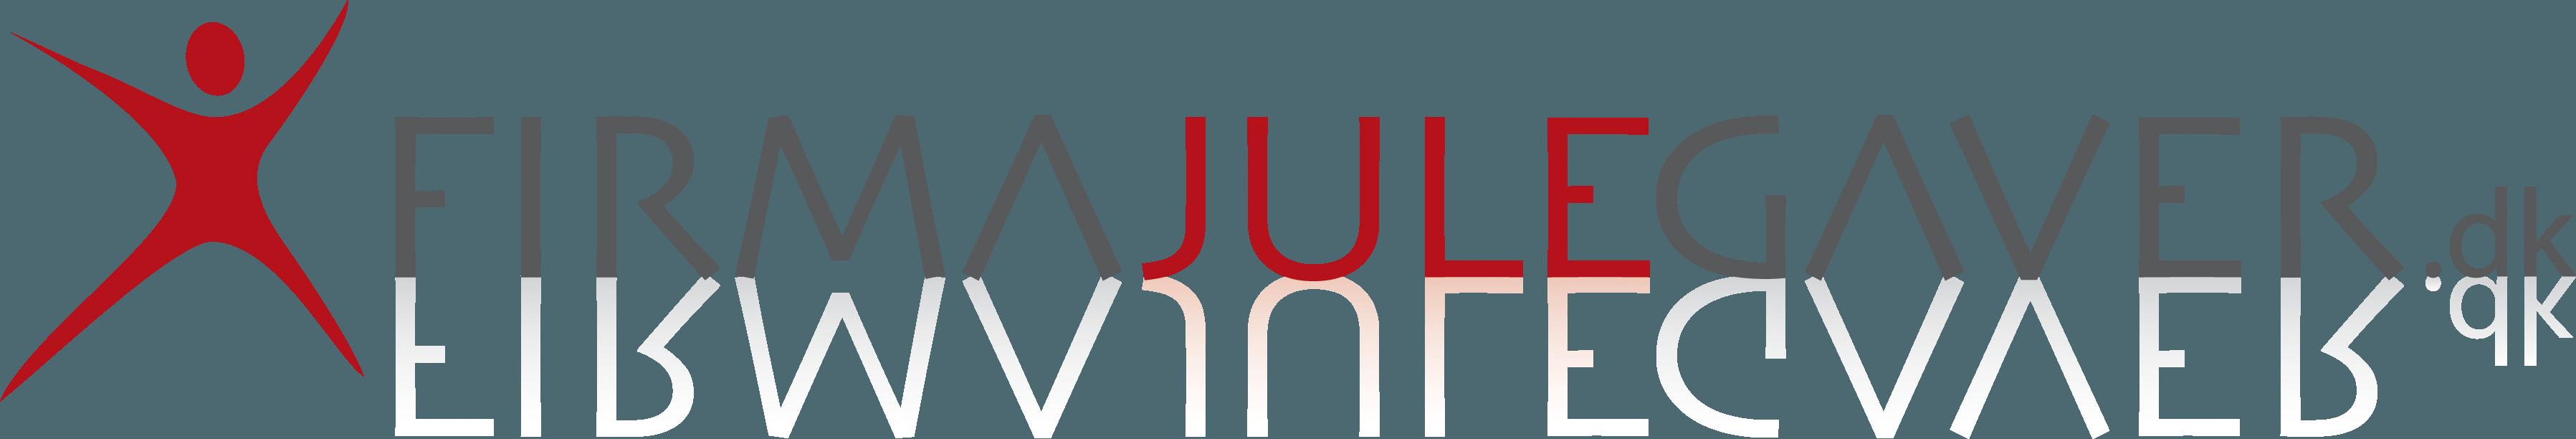 Firmajulegaver - Slogan her